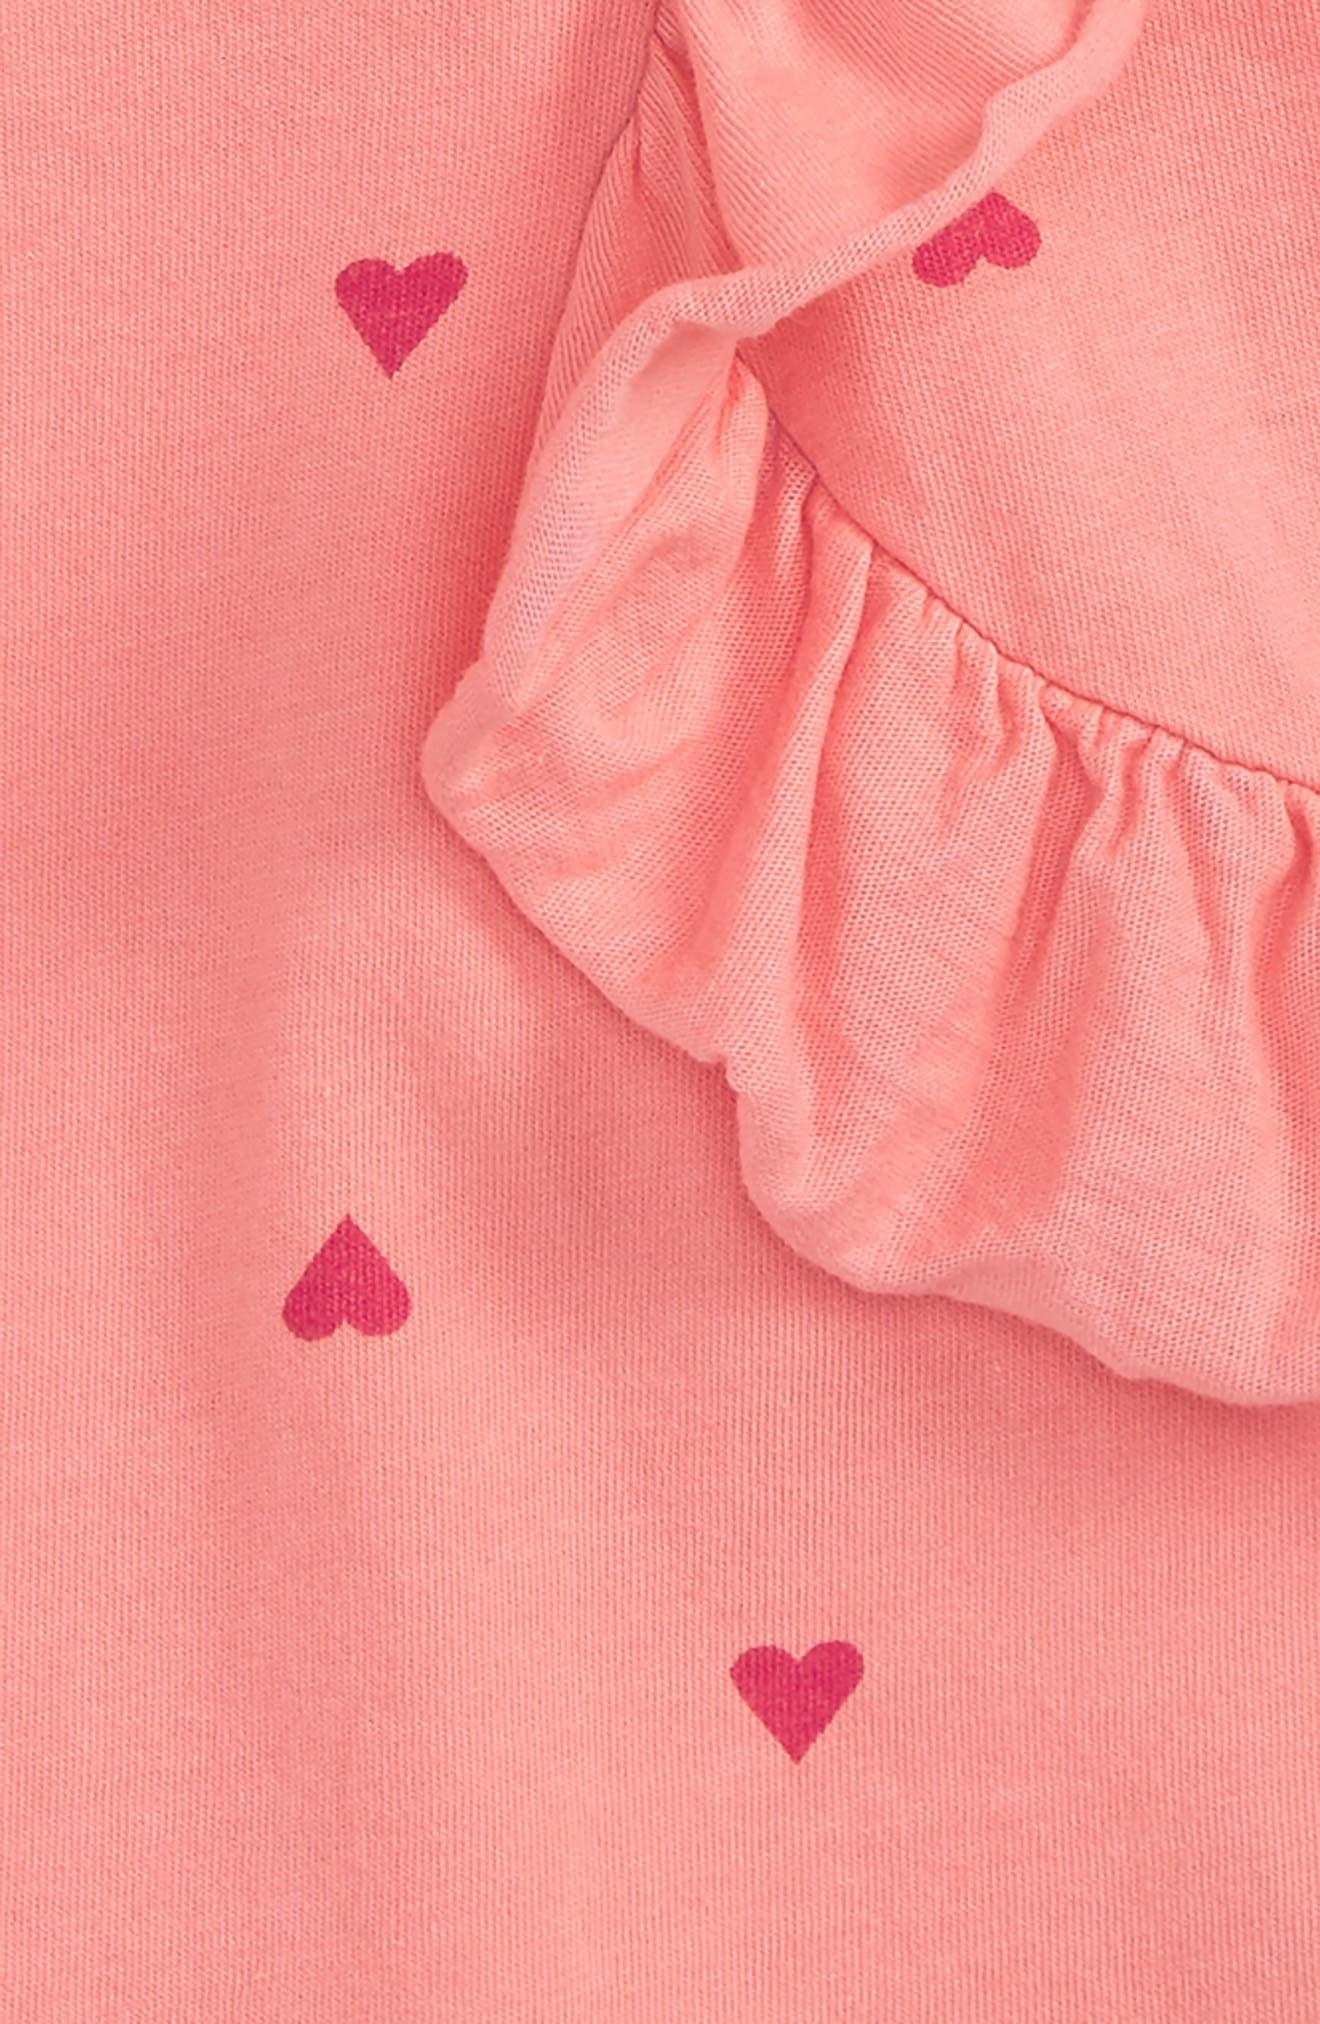 Ruffle Dress,                             Alternate thumbnail 2, color,                             650